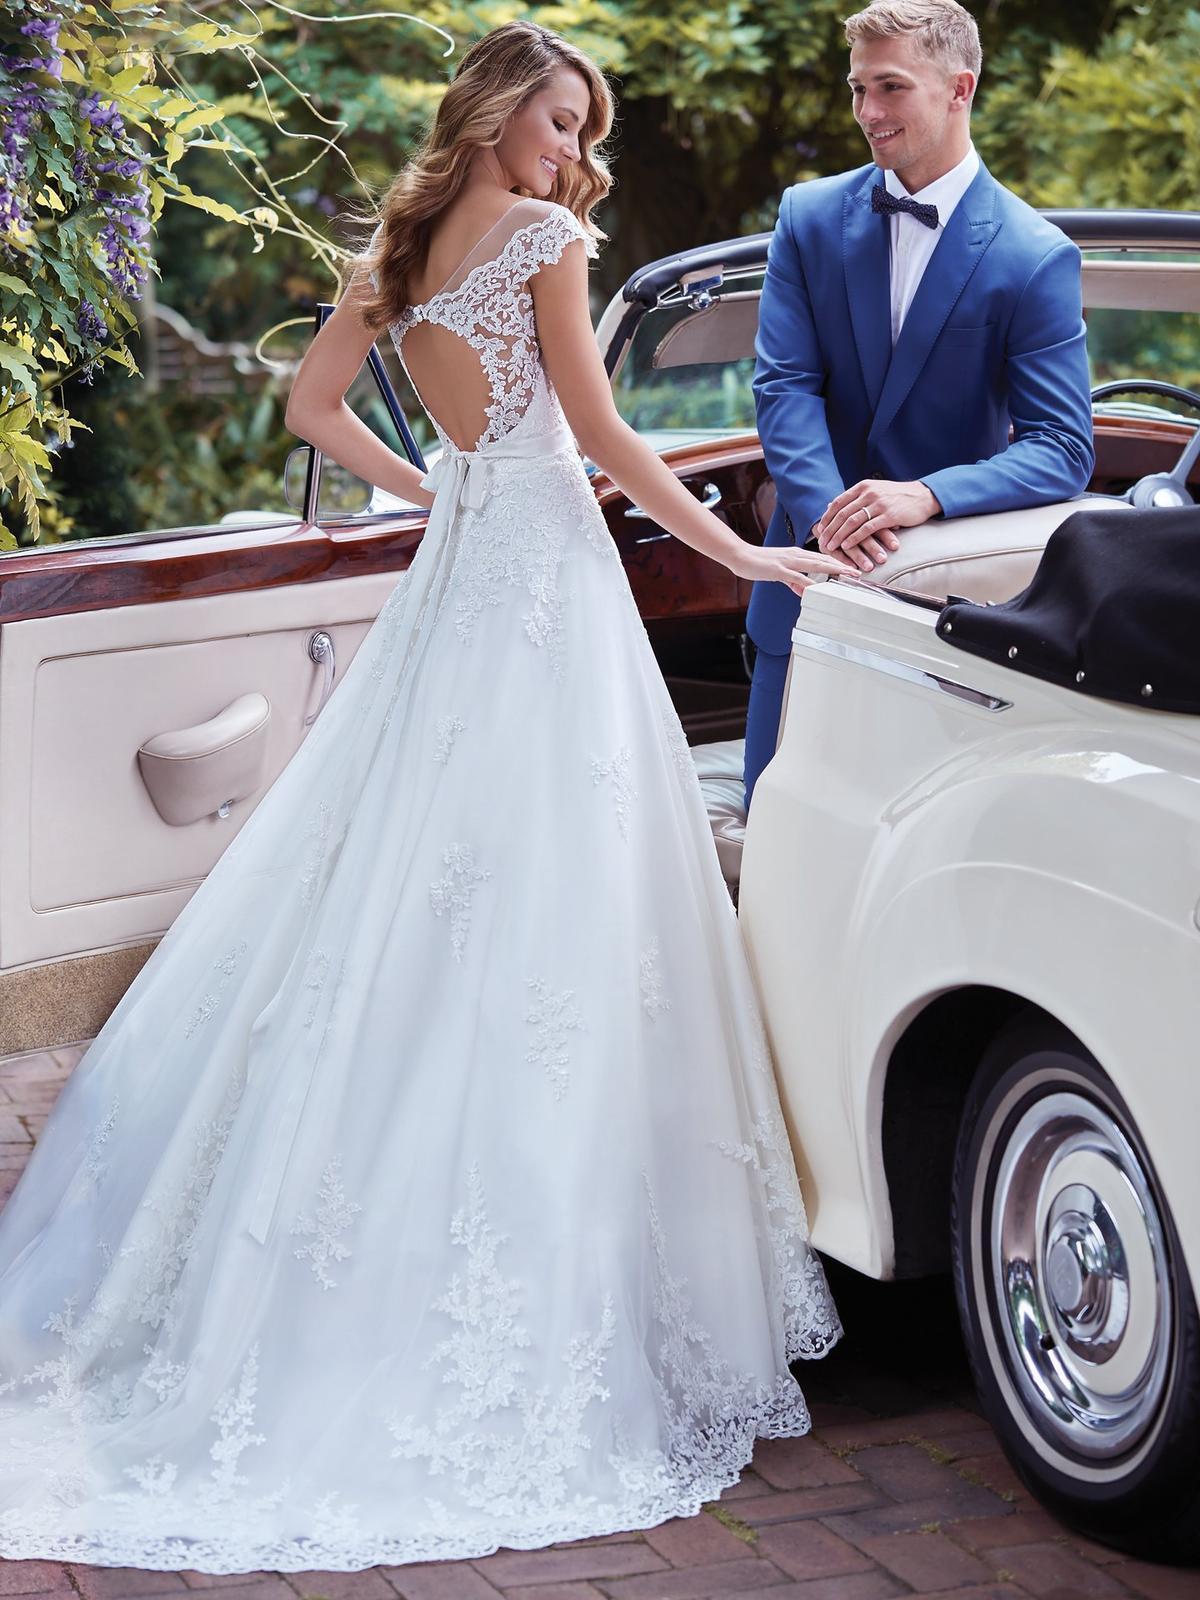 Nové svadobné šaty ♥ KAITLYN ♥ v Nitre - KAITLYN (nová kolekcia)